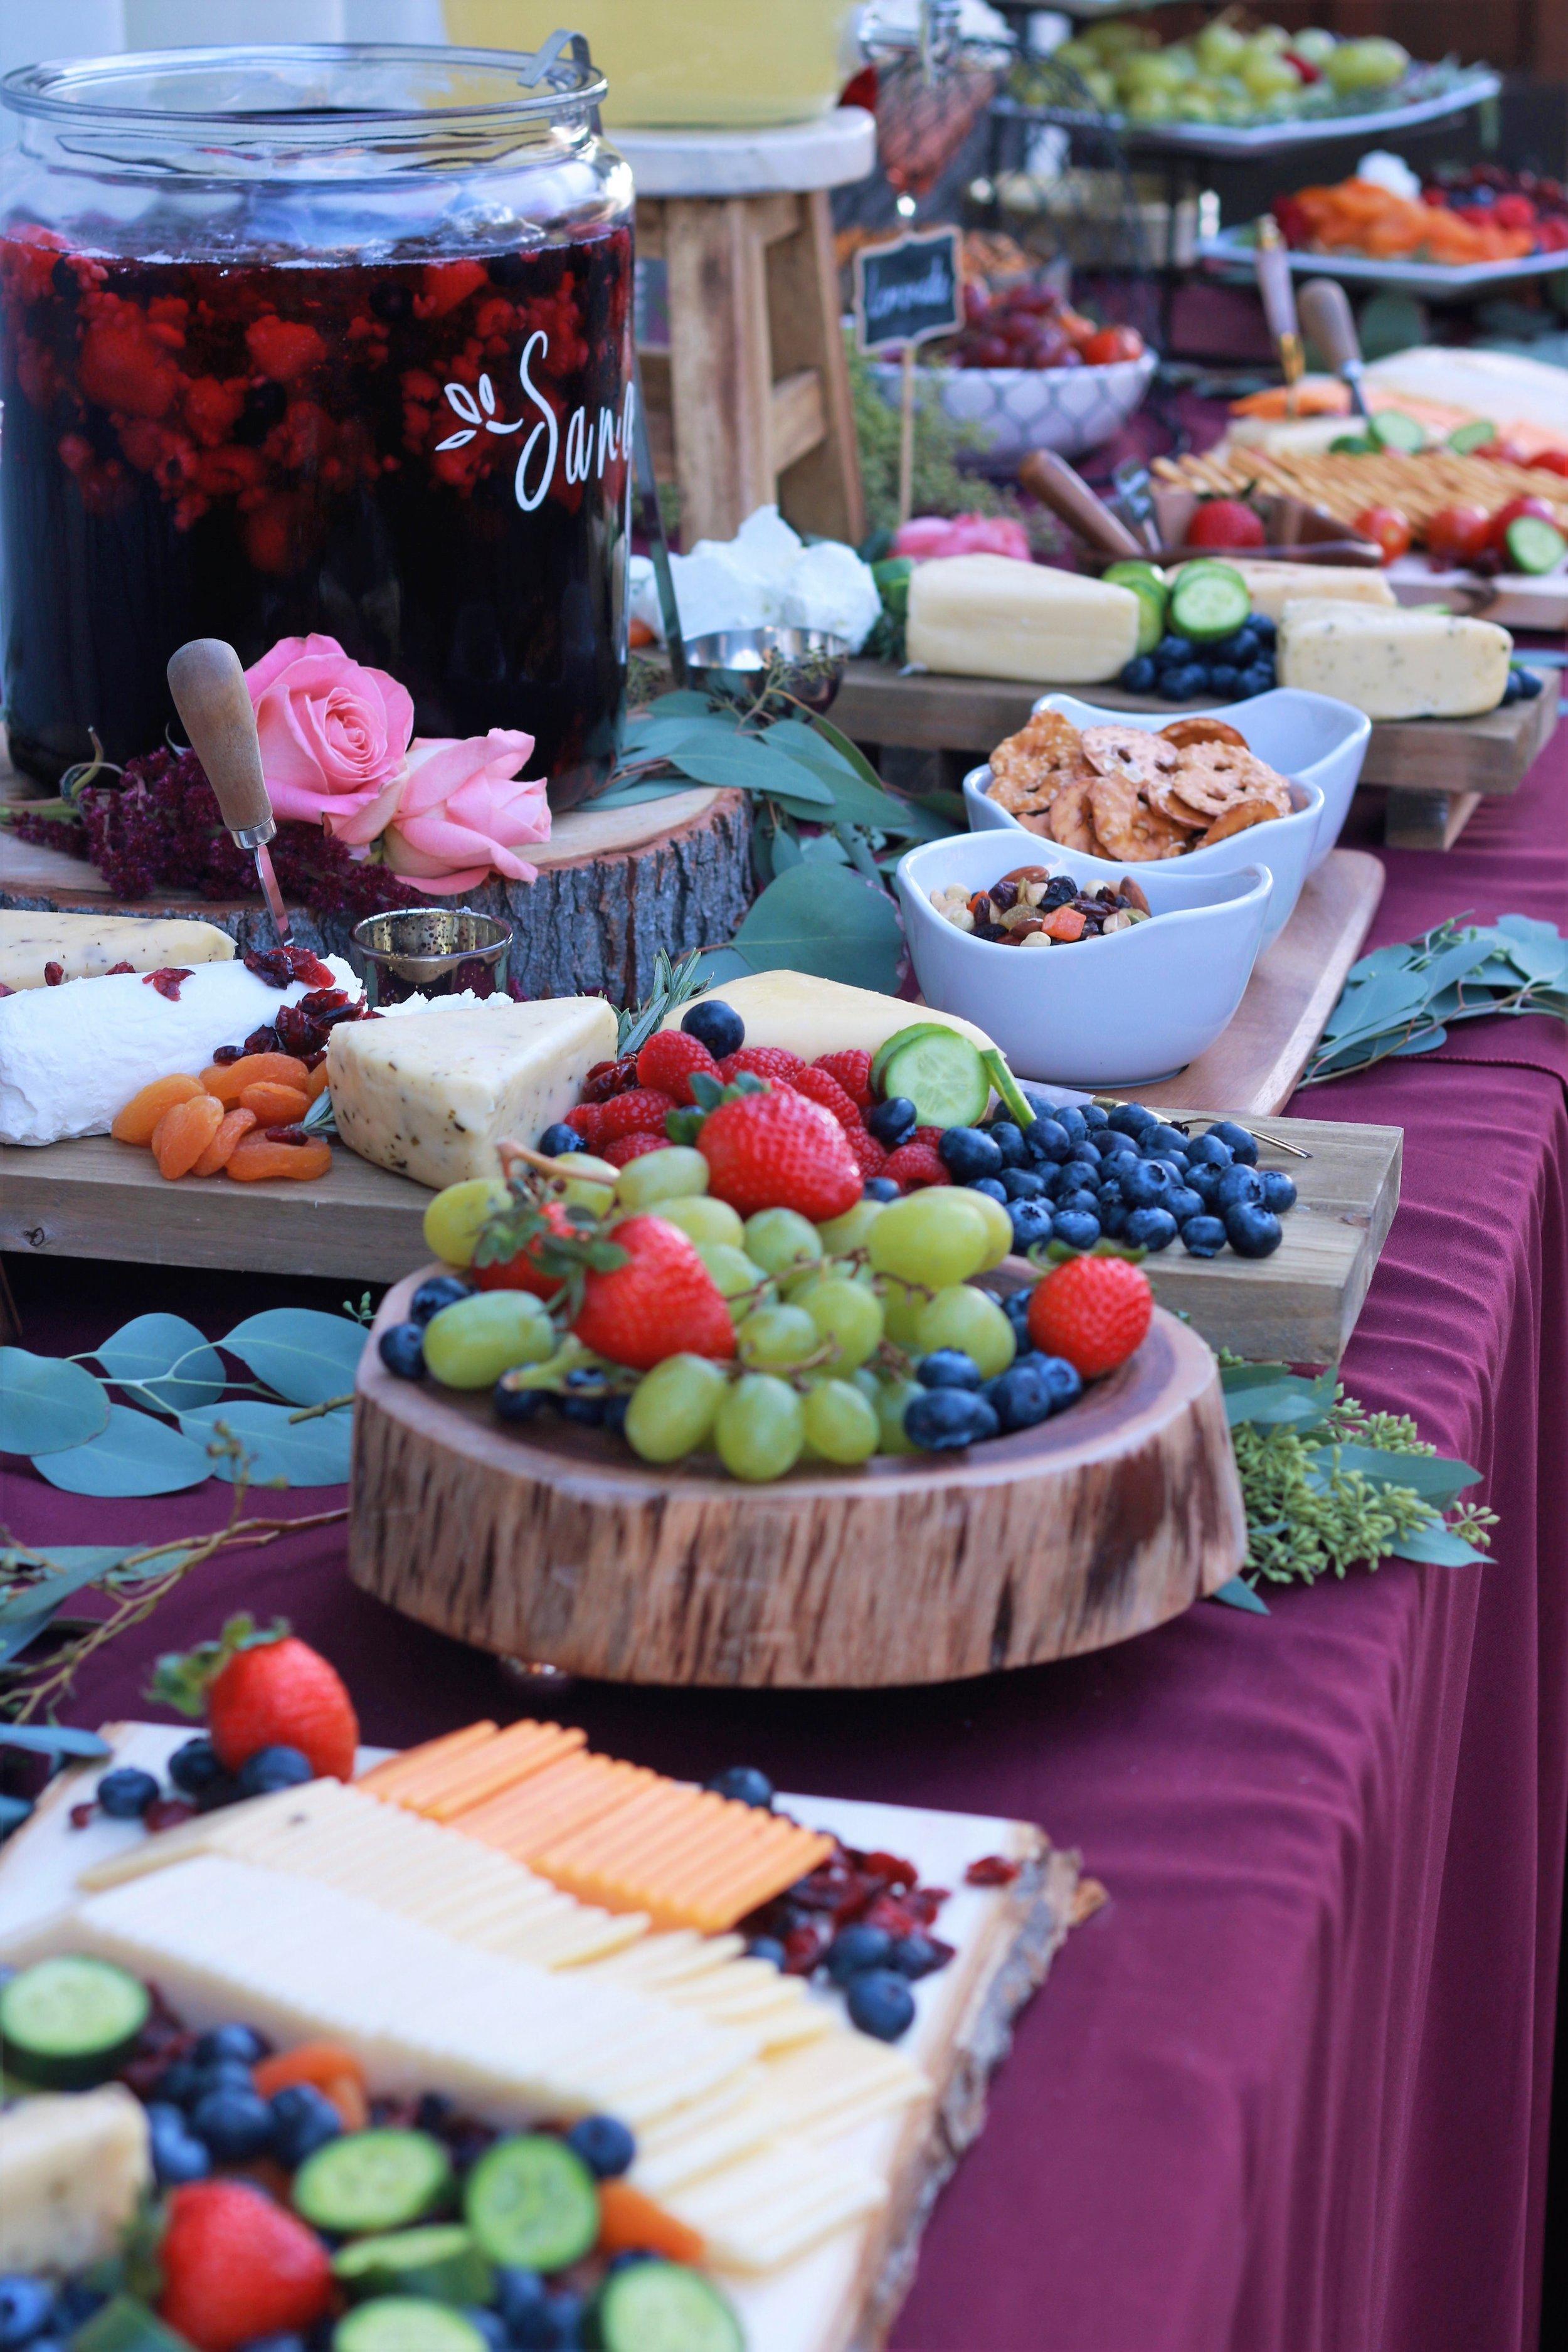 Fall Wedding Food-wedding appetizer table-wedding foods-wedding-burgundy wedding-rustic wedding-sangria-wedding cocktail hour-www.SugarPartiesLA.com